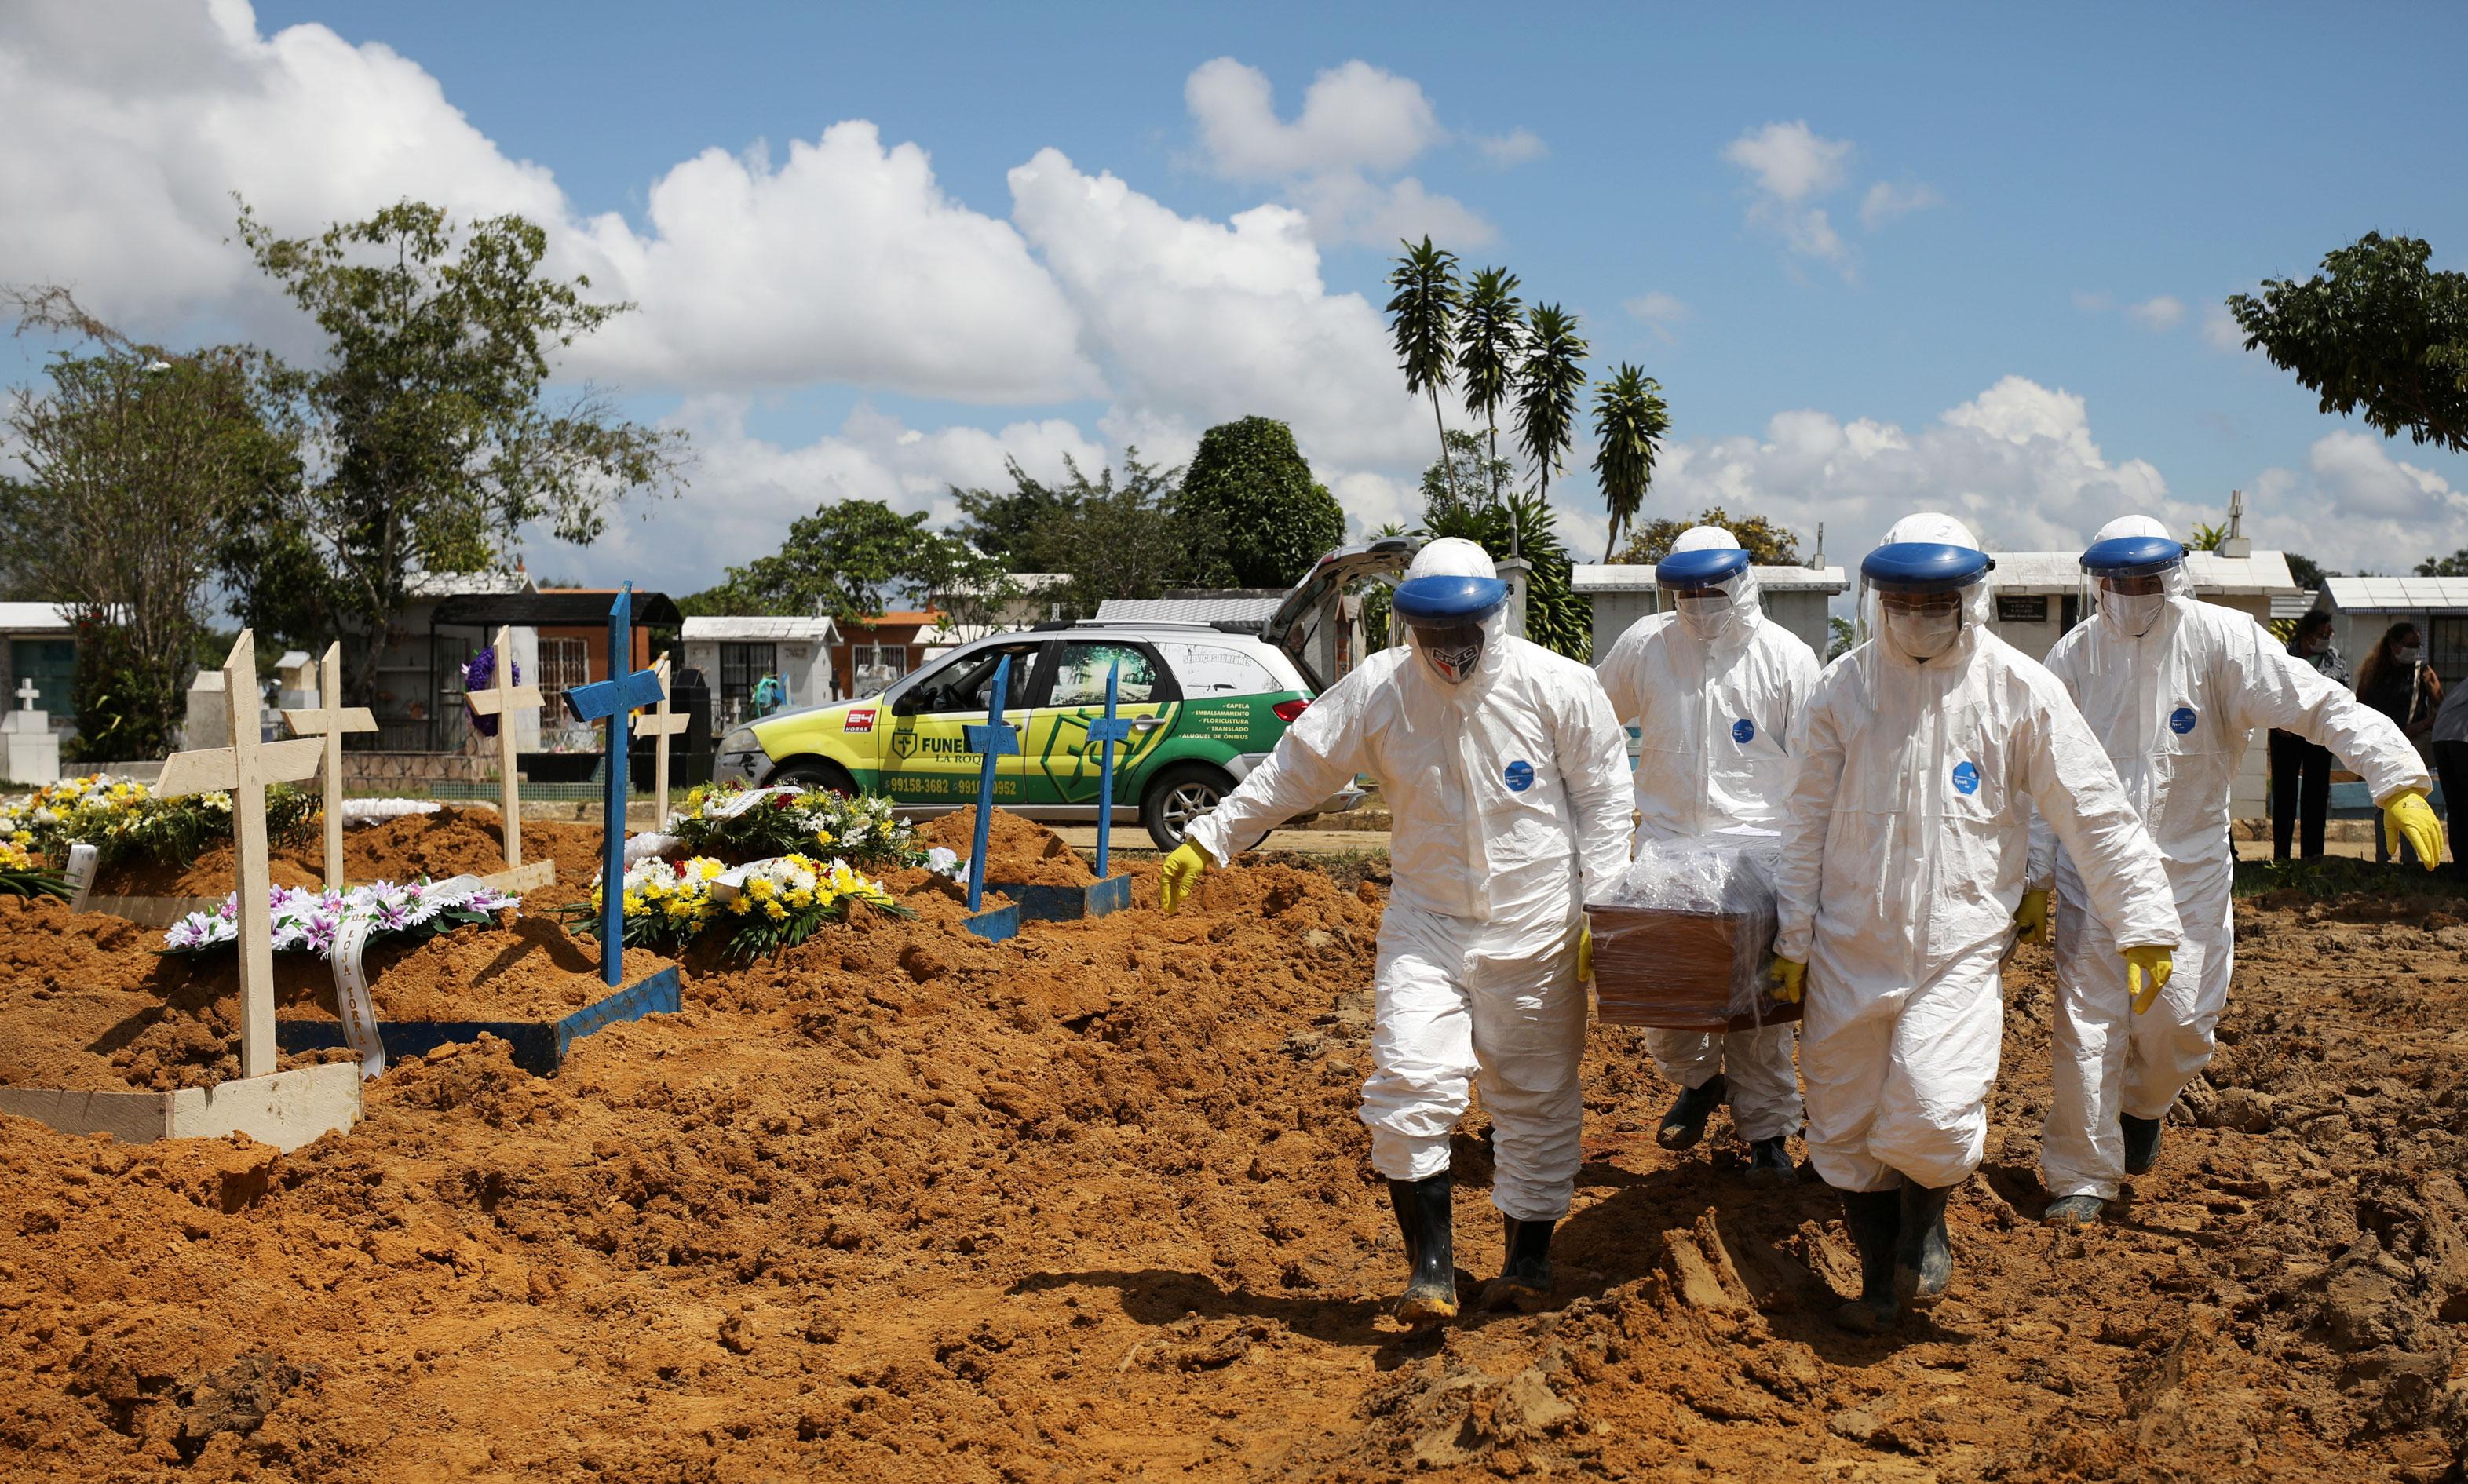 Enterro em Manaus durante pandemia da Covid-19